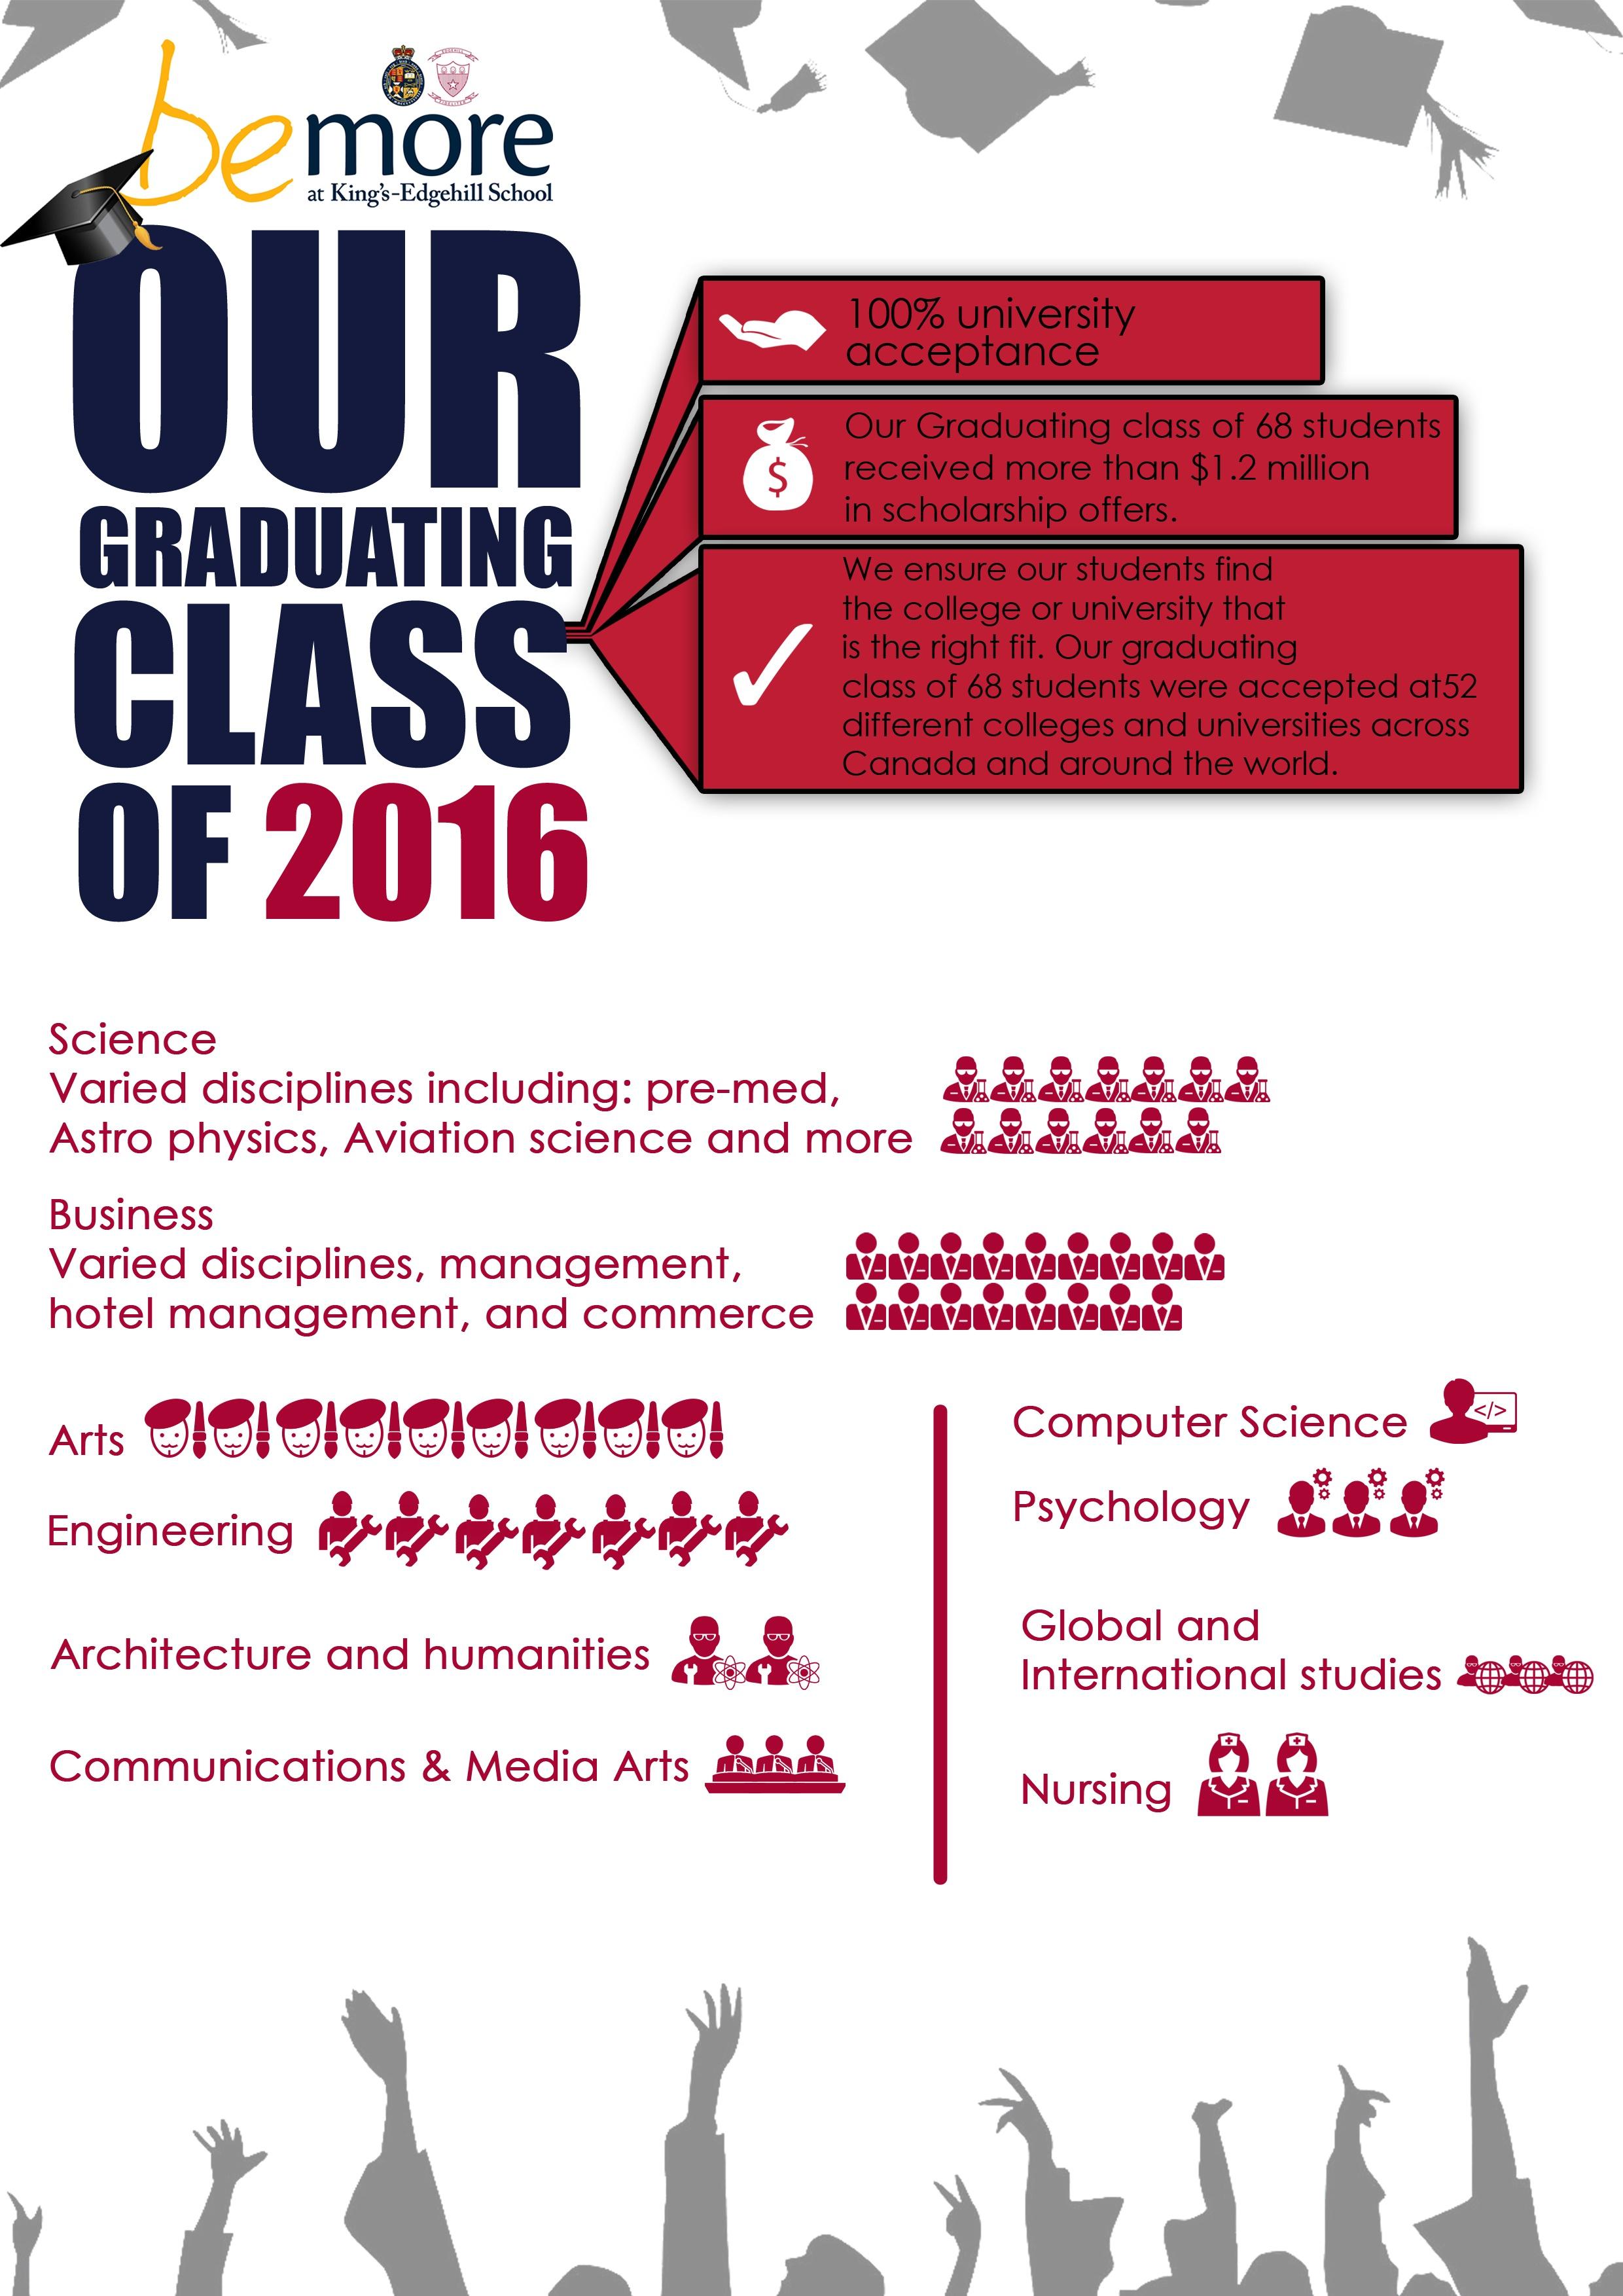 Graduating_class_of_2016.jpg